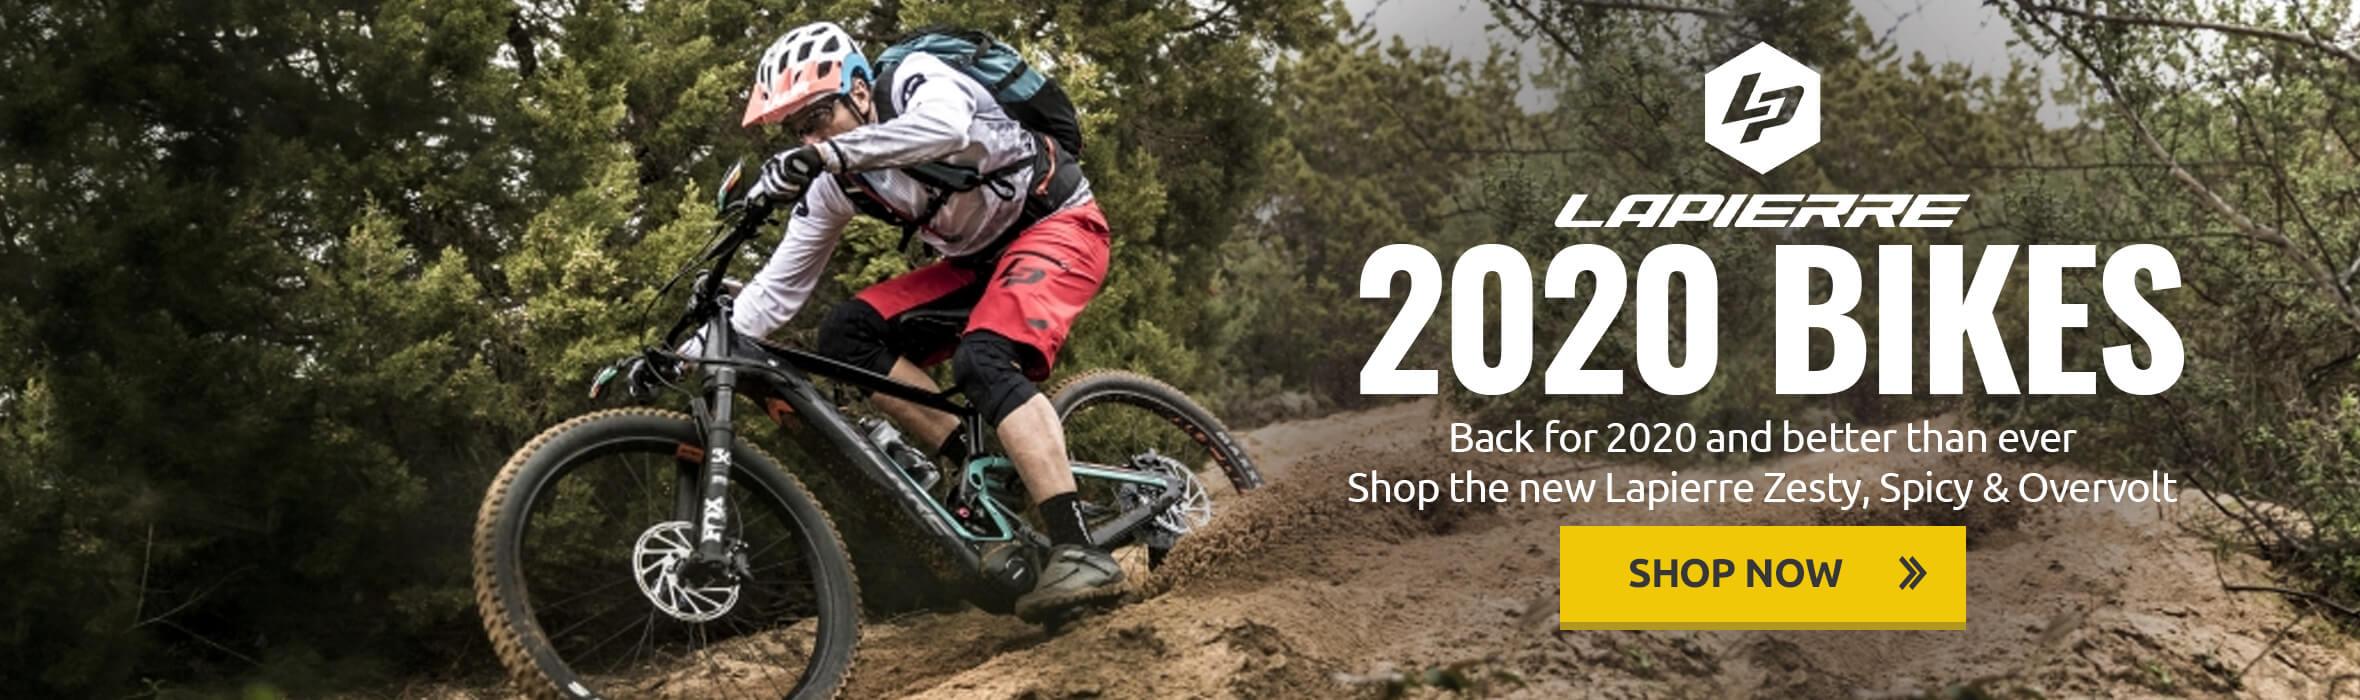 Lapierre 2020 Bikes